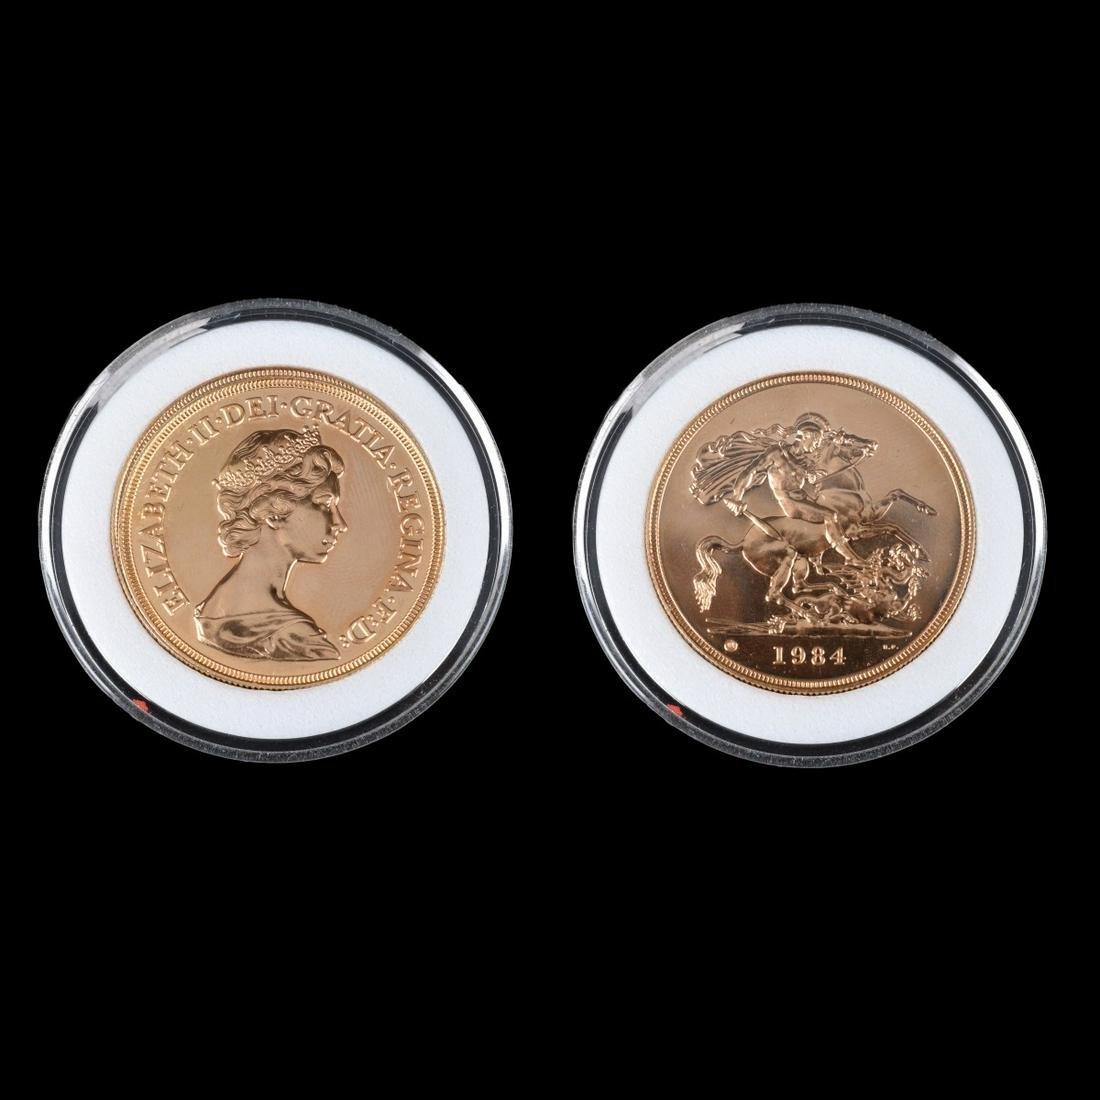 1984 Great Britain Elizabeth II Gold 5 pounds